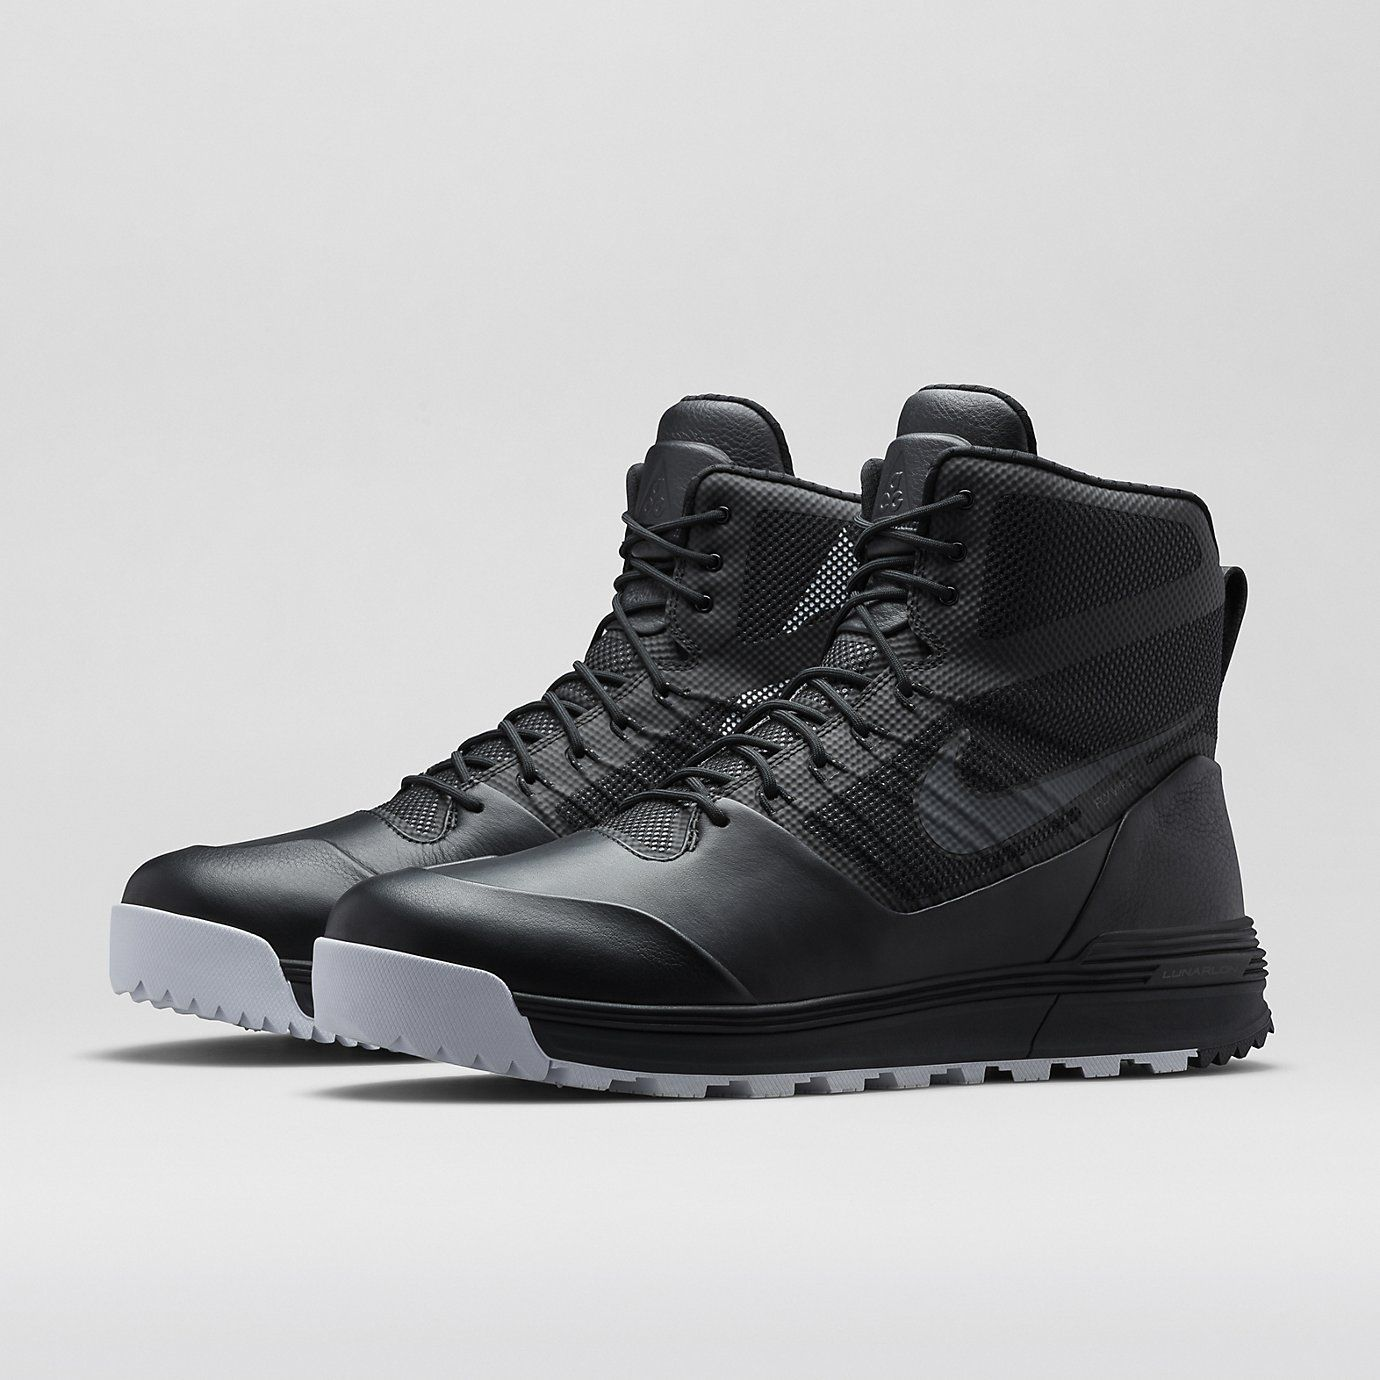 the latest fcf58 1b9d6 Nike Store The 2013 Lunarterra Arktos is updated this 2014 season with the  NikeLab ACG Lunarterra Arktos.